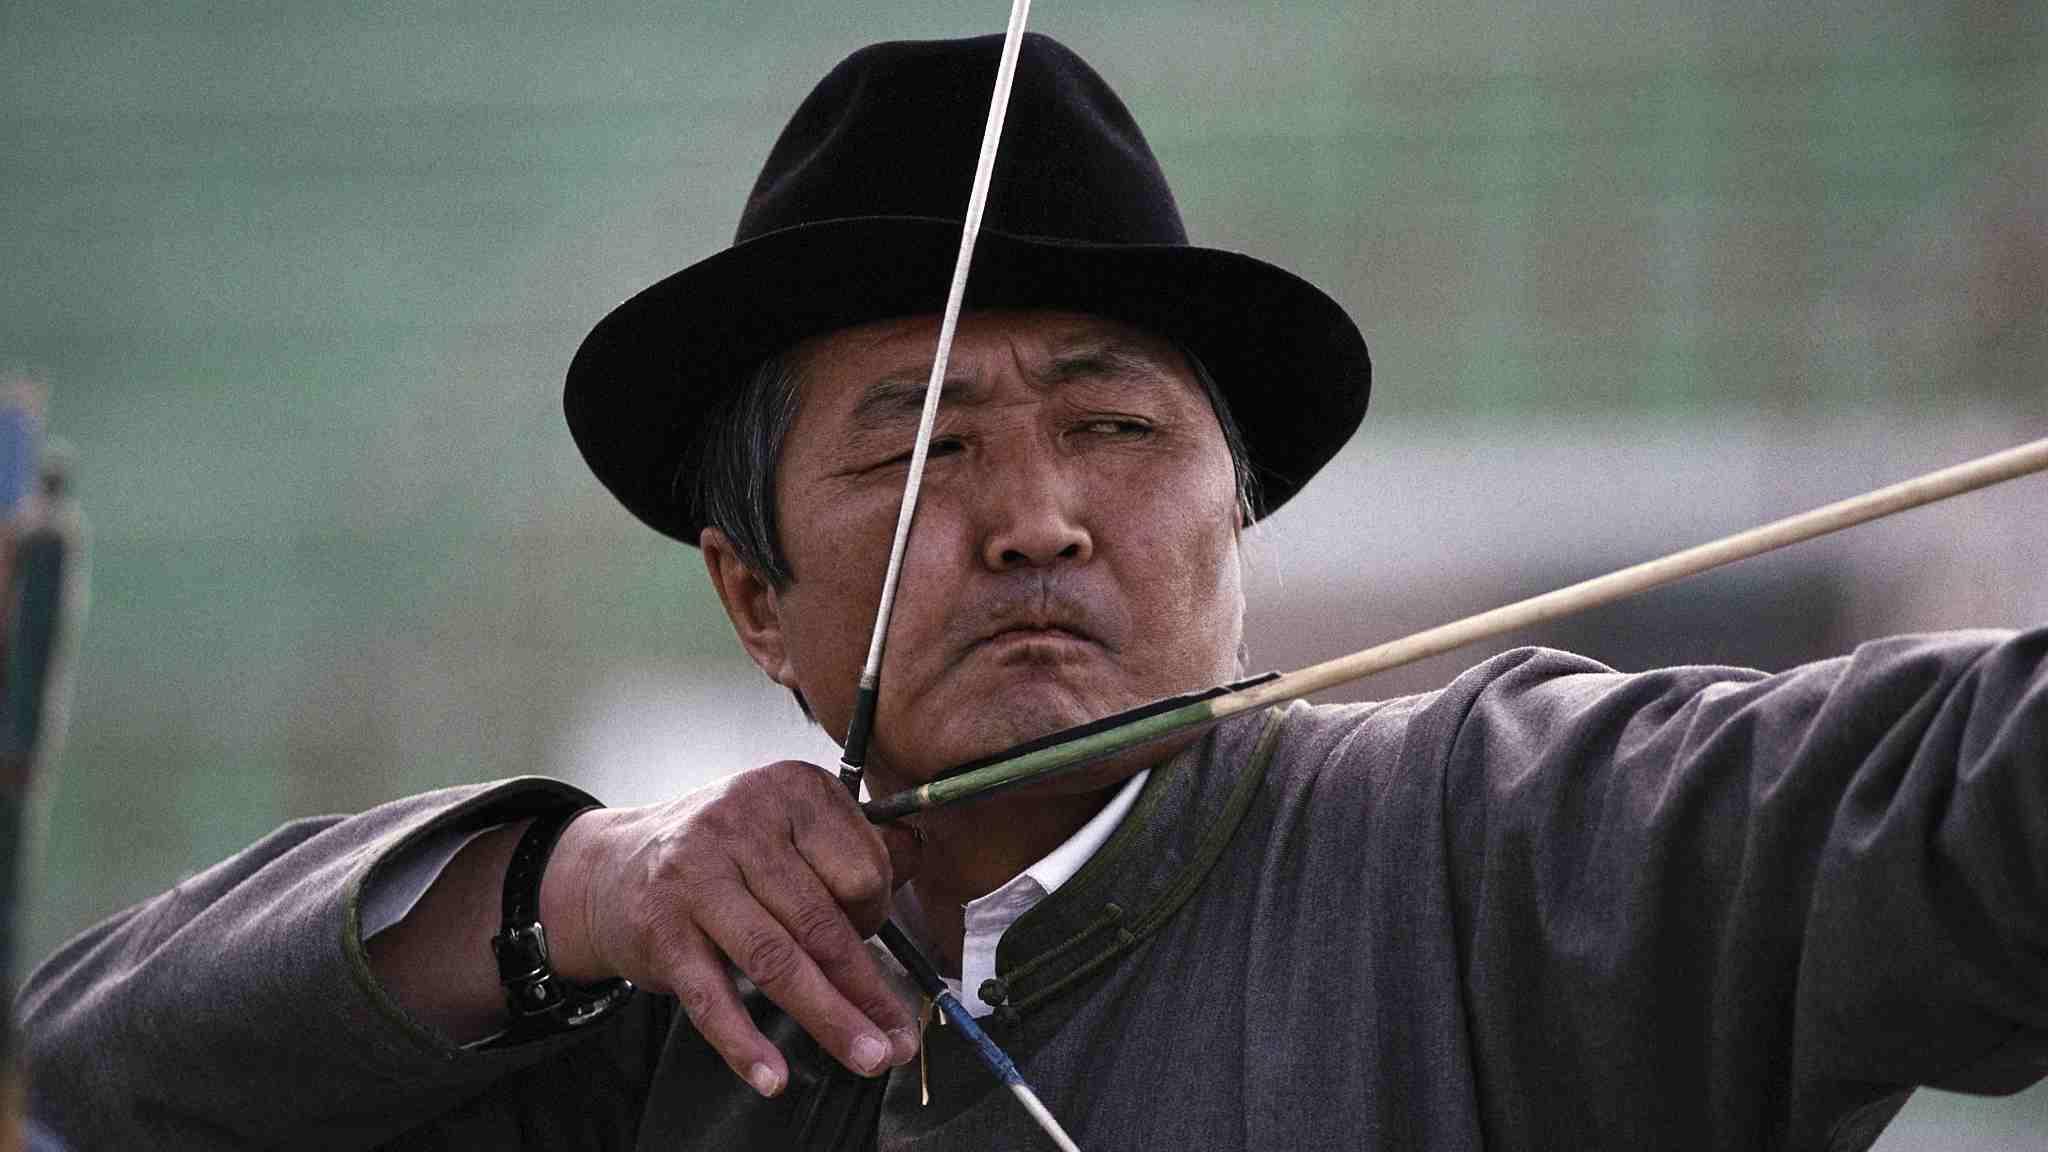 The Naadam Festival: A feast for the grassland nomads - CGTN